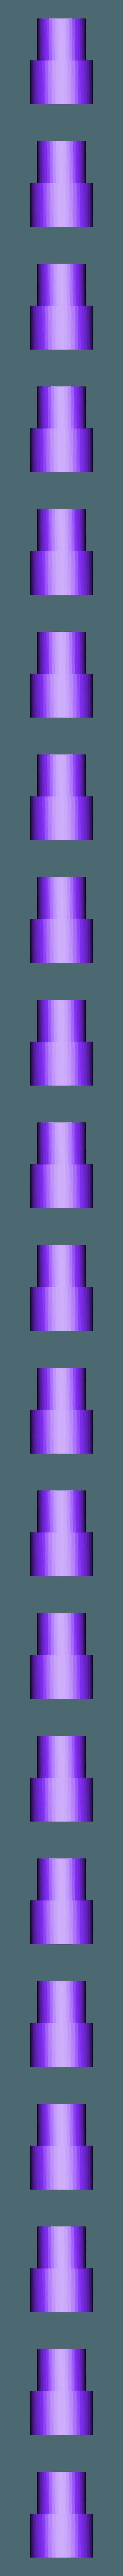 Mounting Shaft, Avengers Logo.STL Download free STL file Avengers Rotating Logo • 3D printing template, potentprintables